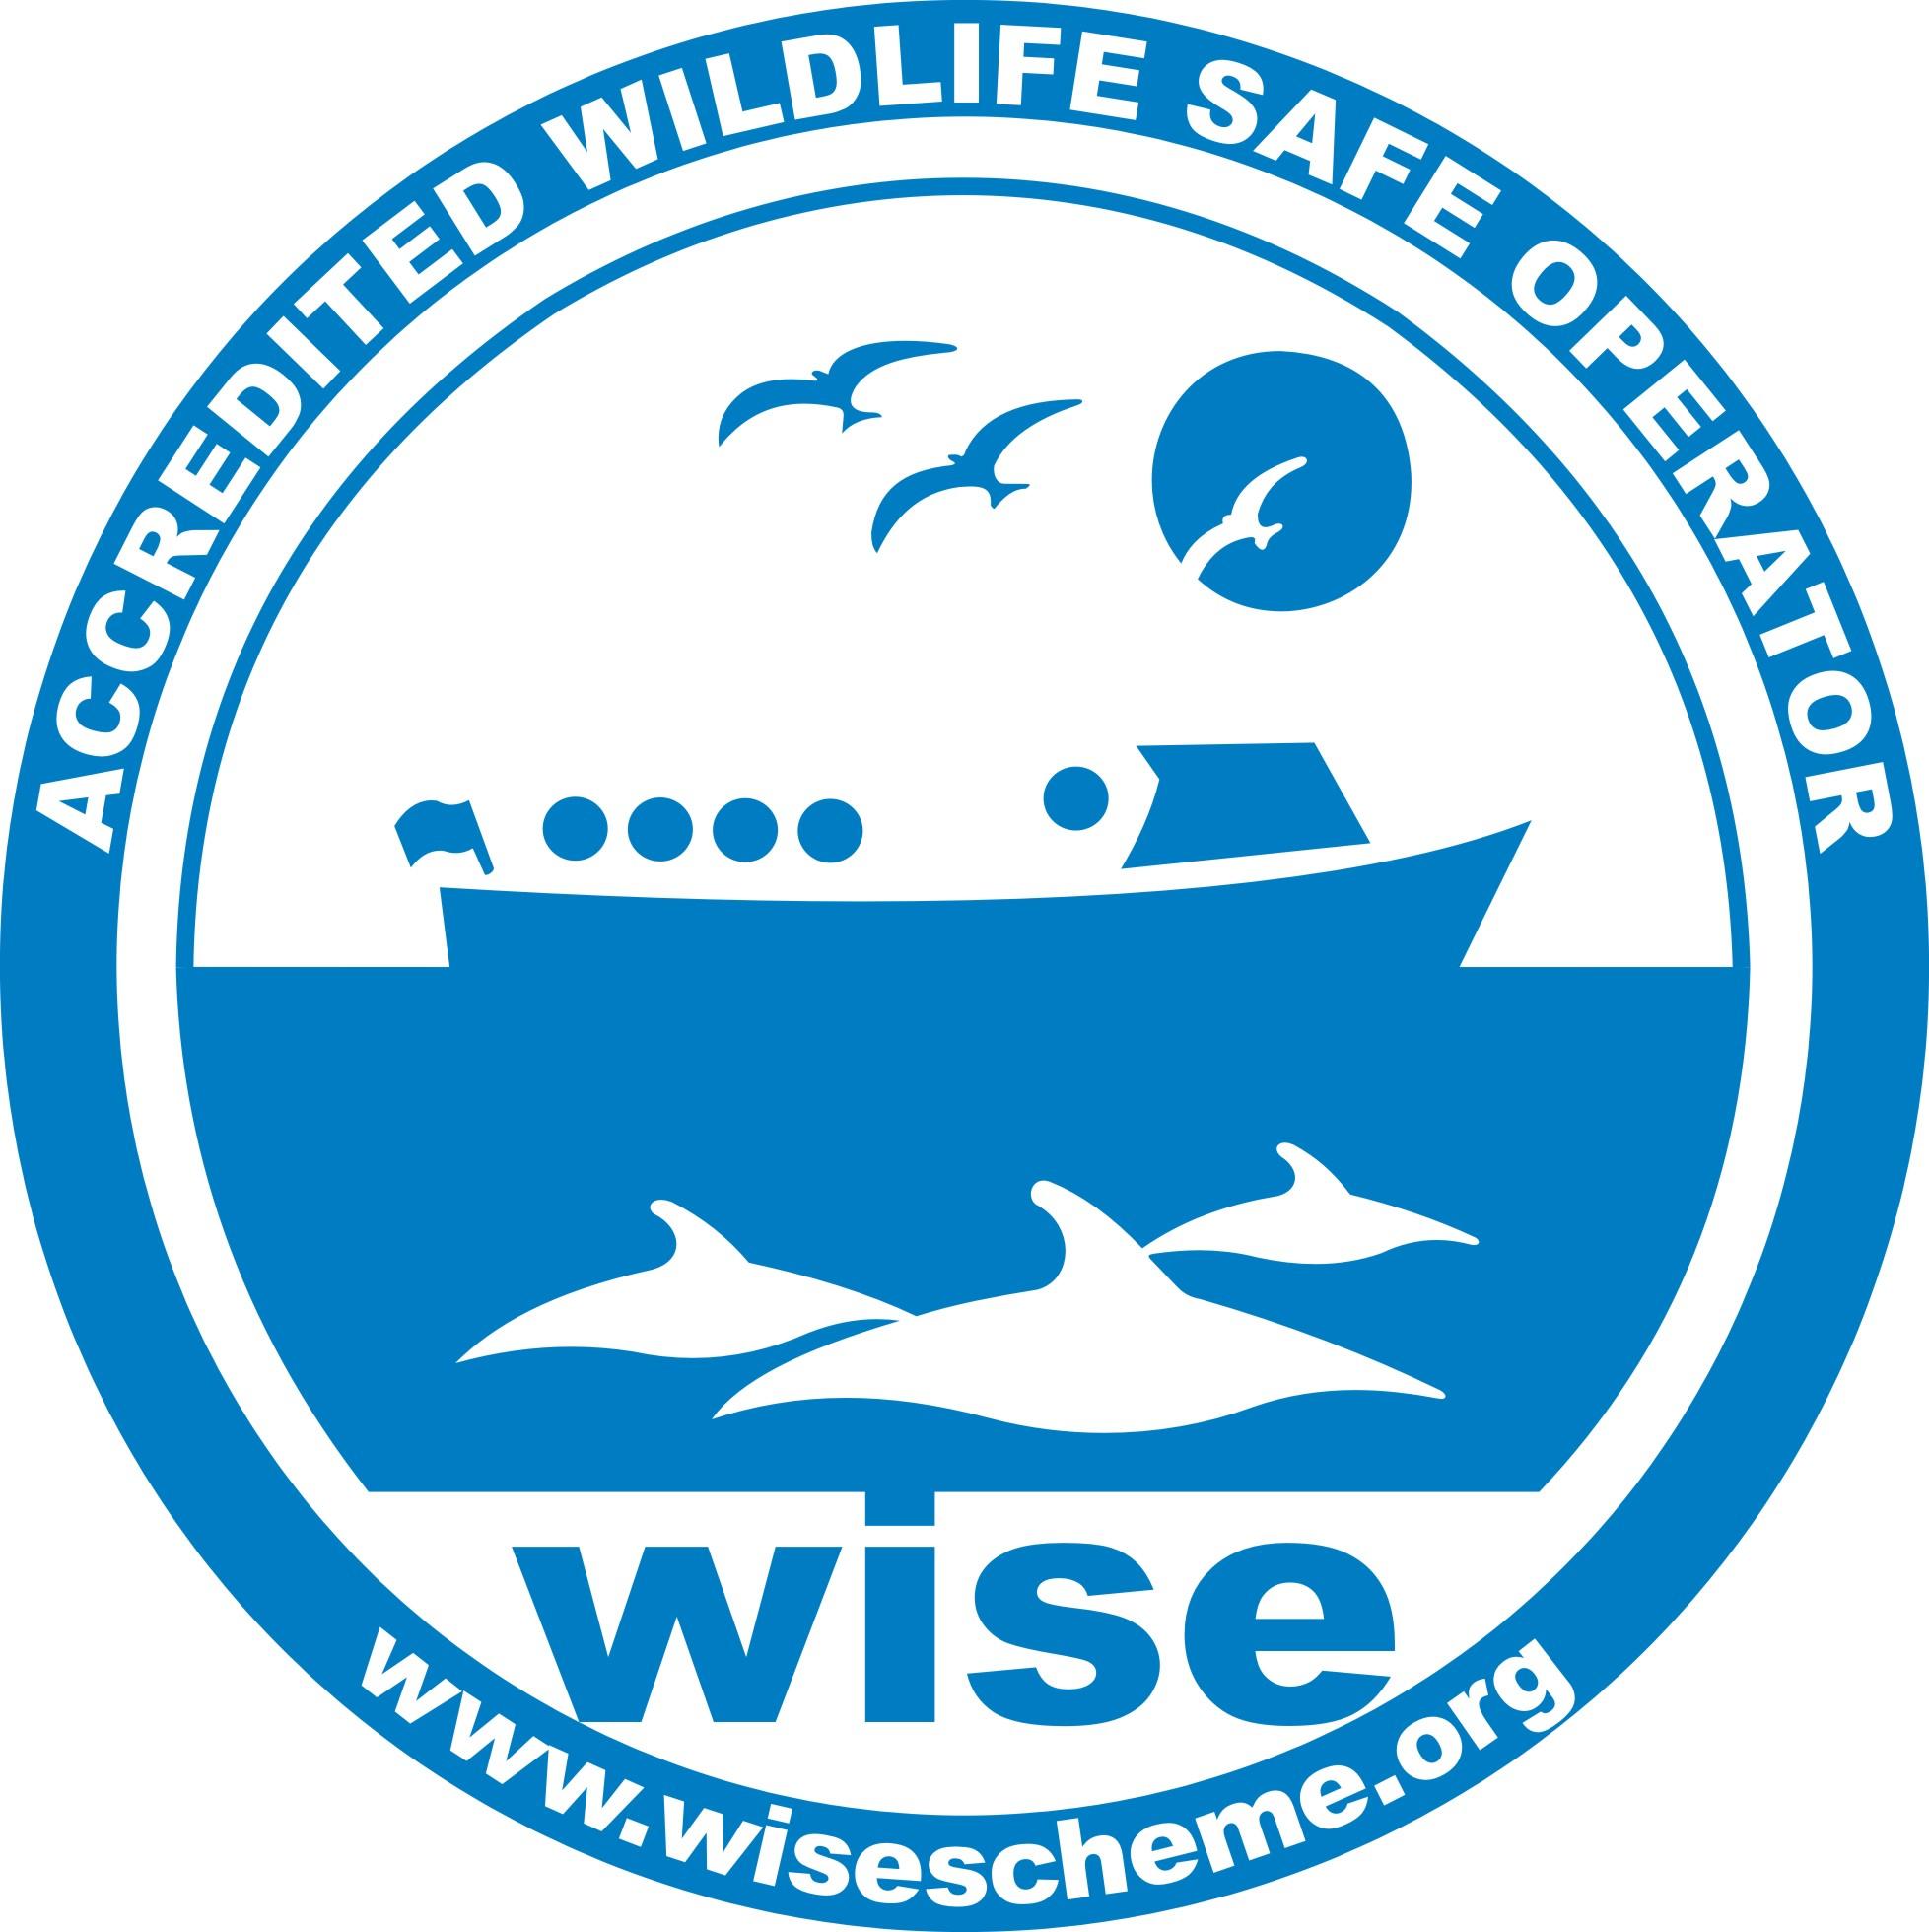 wildlife-wise-sup-safari